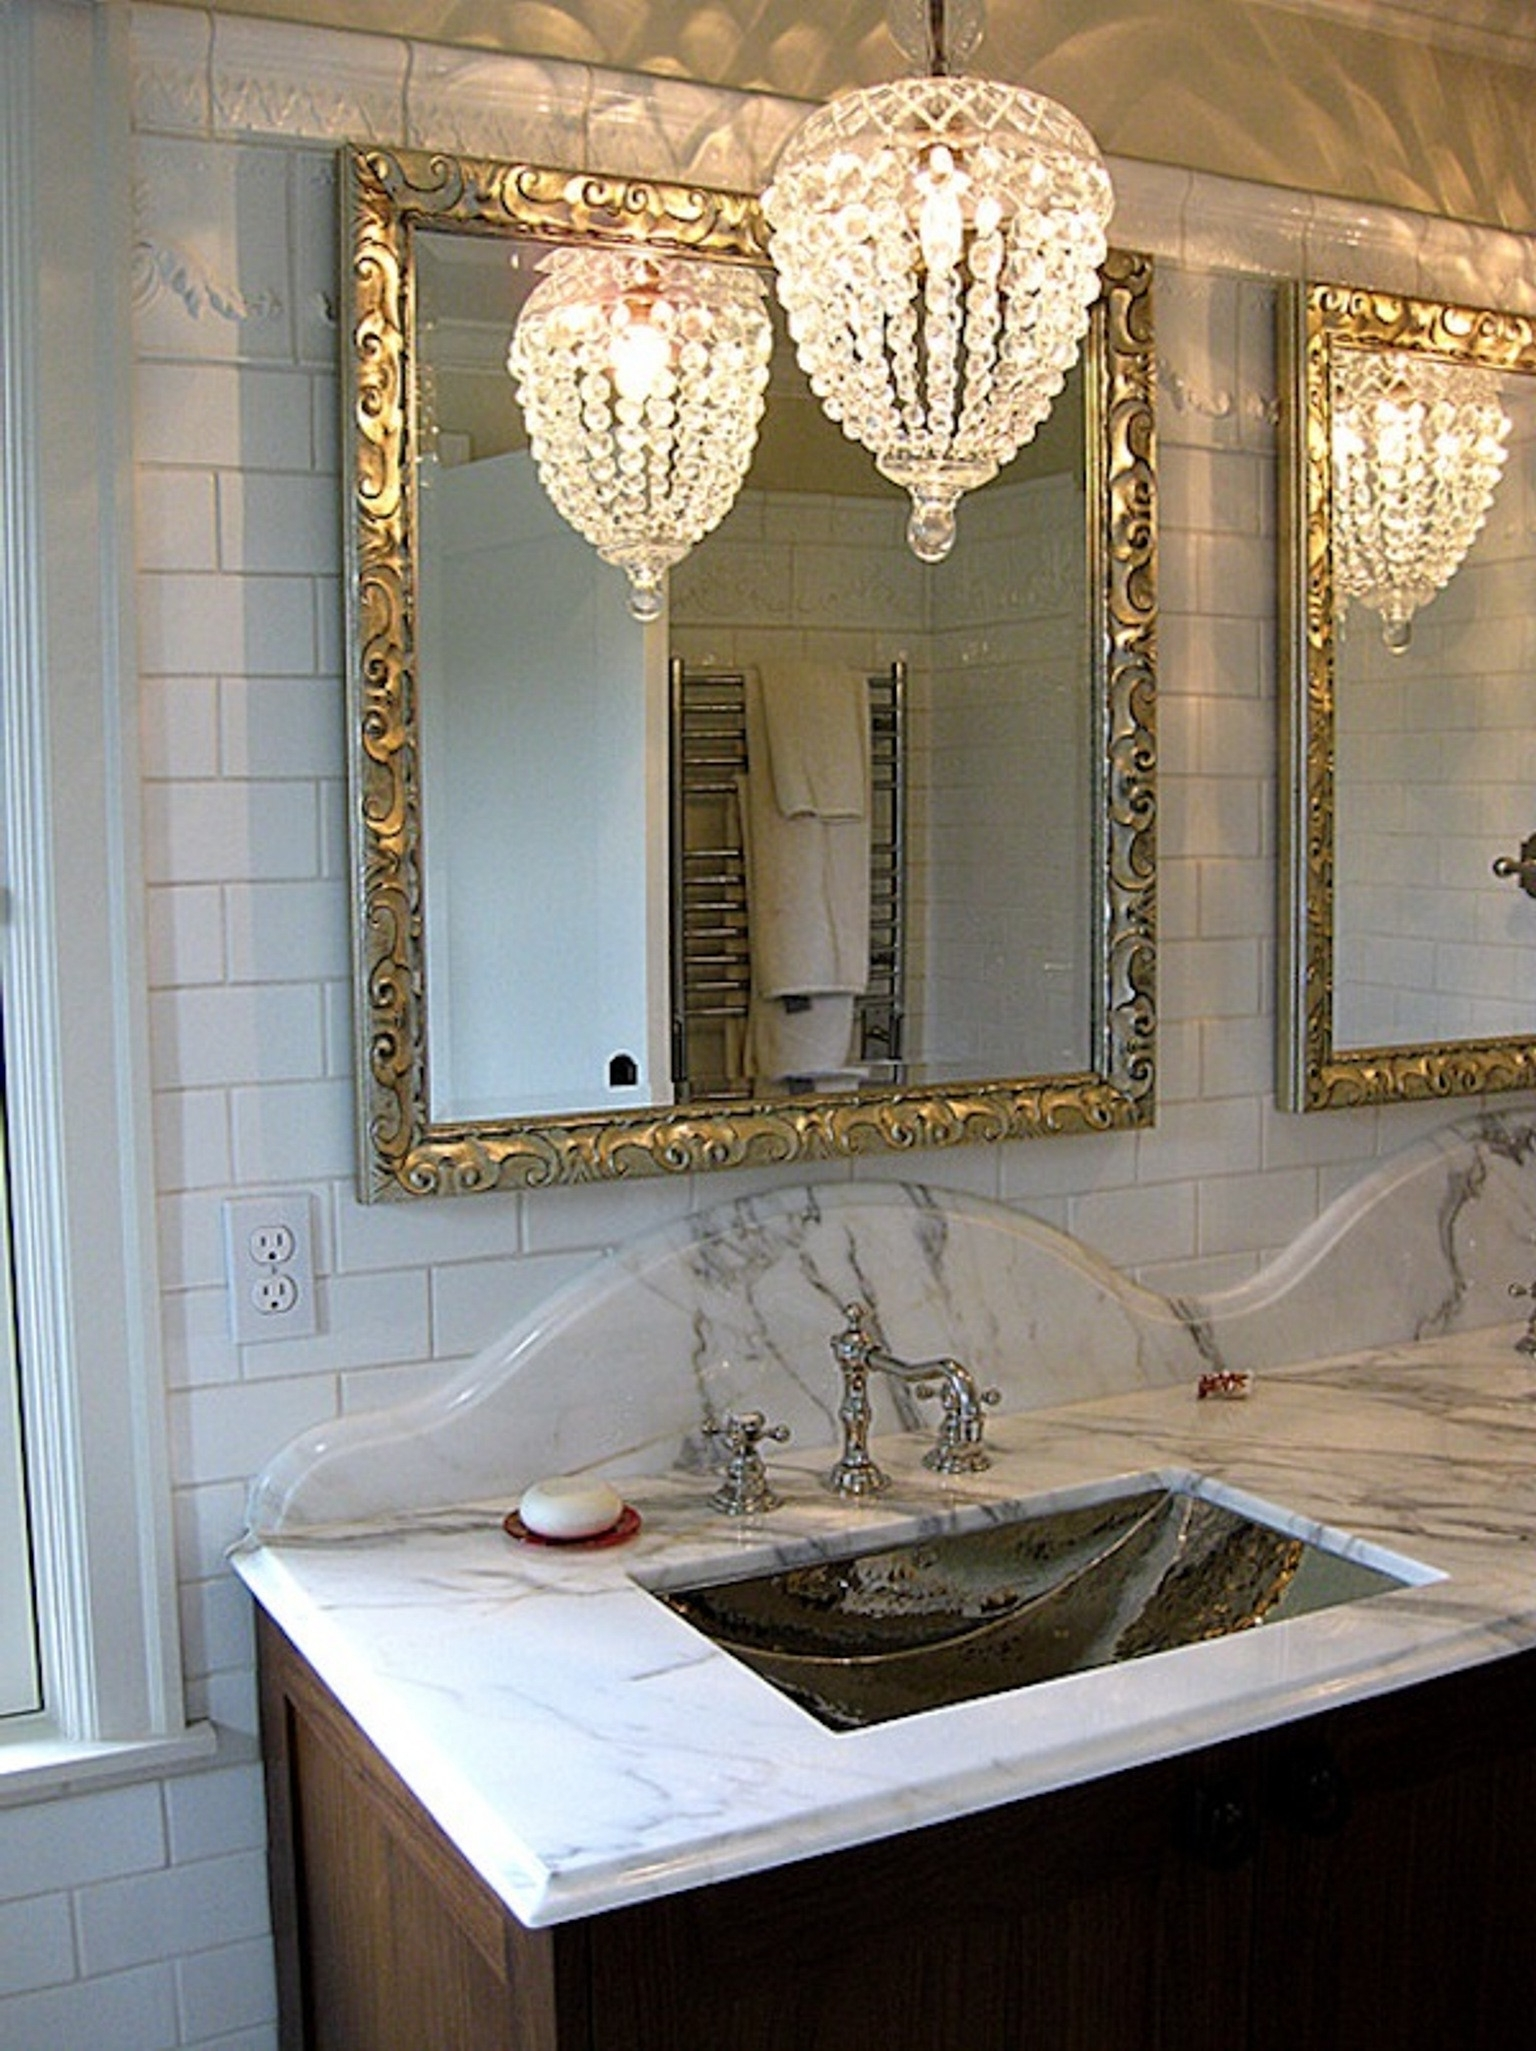 Trendy Chandeliers : Bathroom Chandeliers Ideas Elegant Beneficial Bathroom Intended For Bathroom Lighting Chandeliers (View 6 of 20)